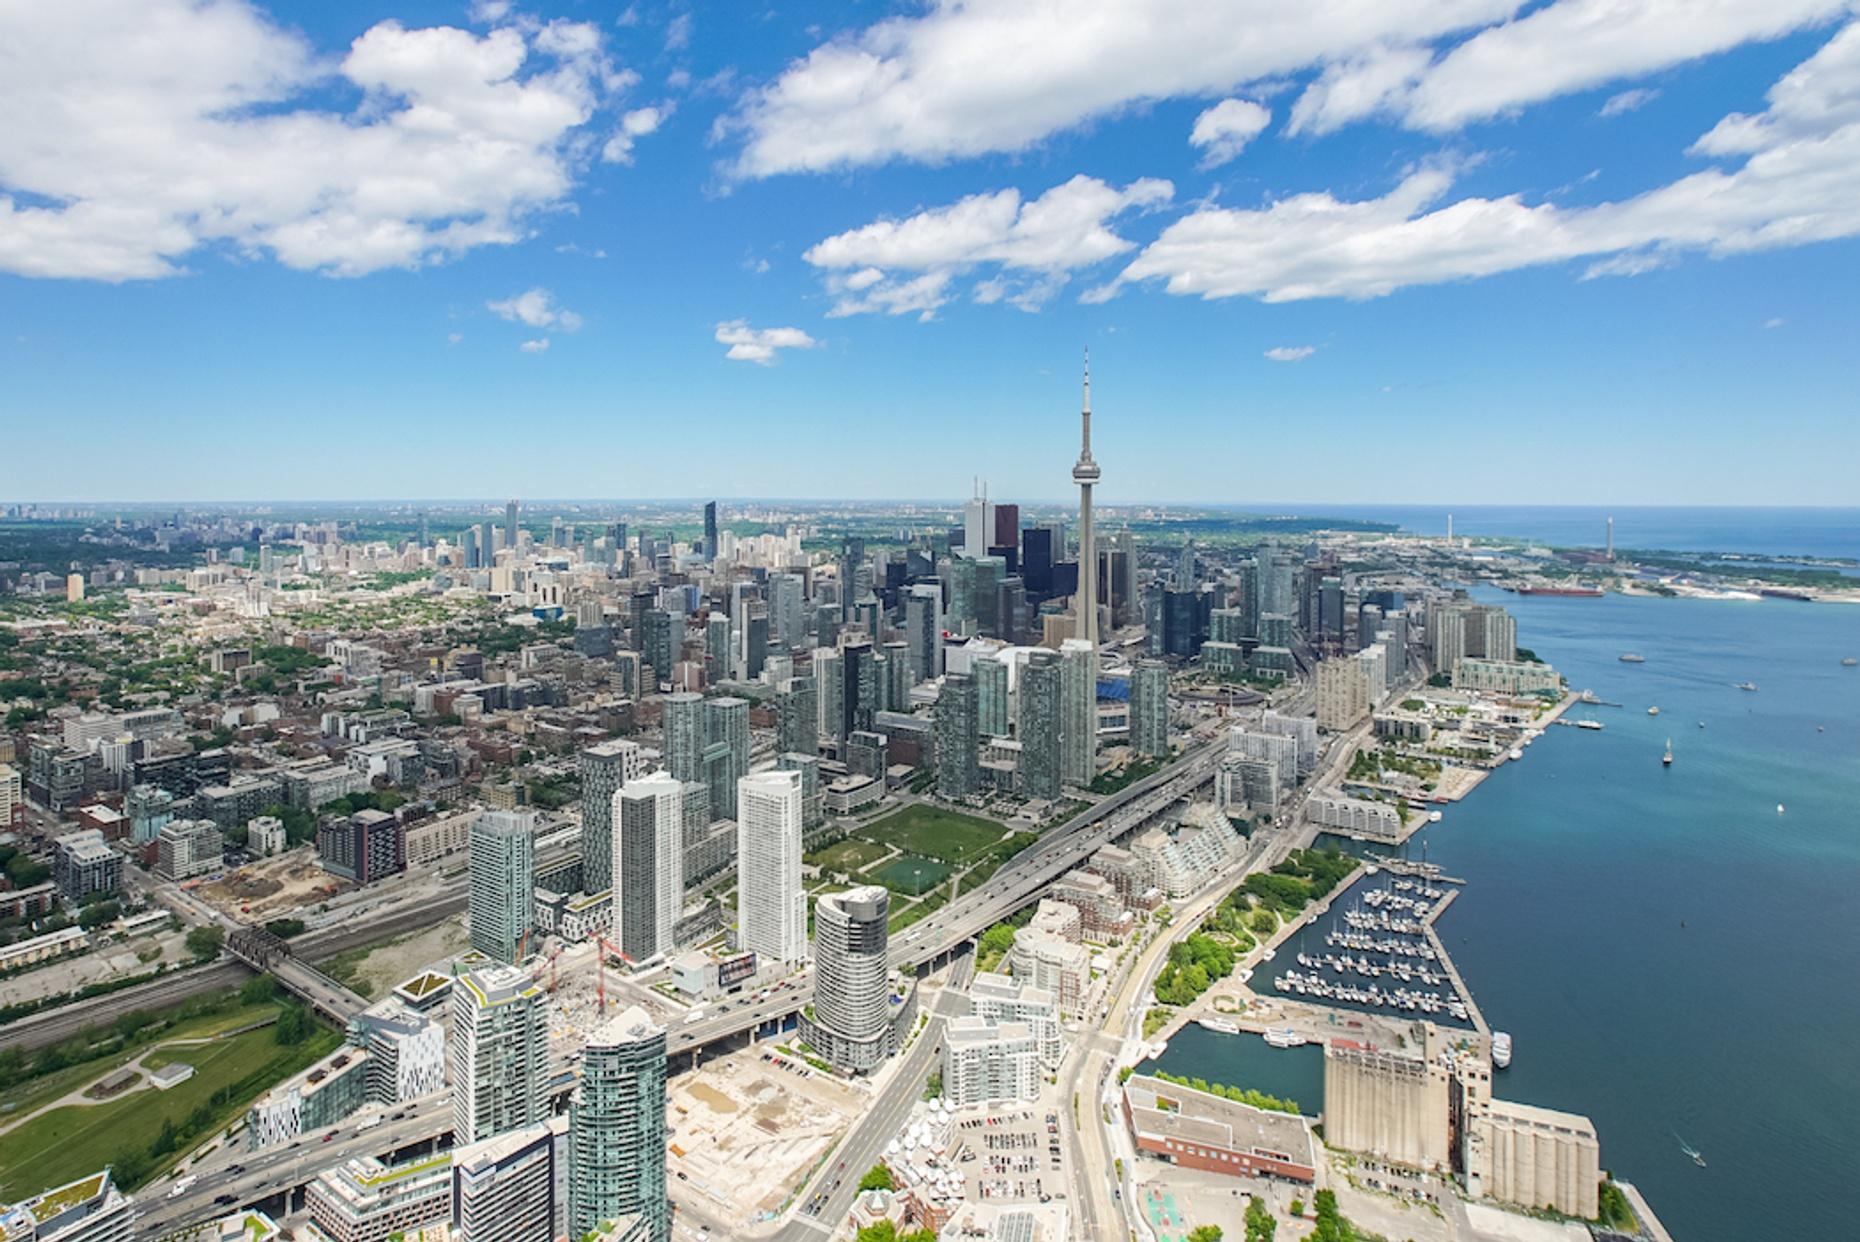 100 KM Plane Tour of Toronto